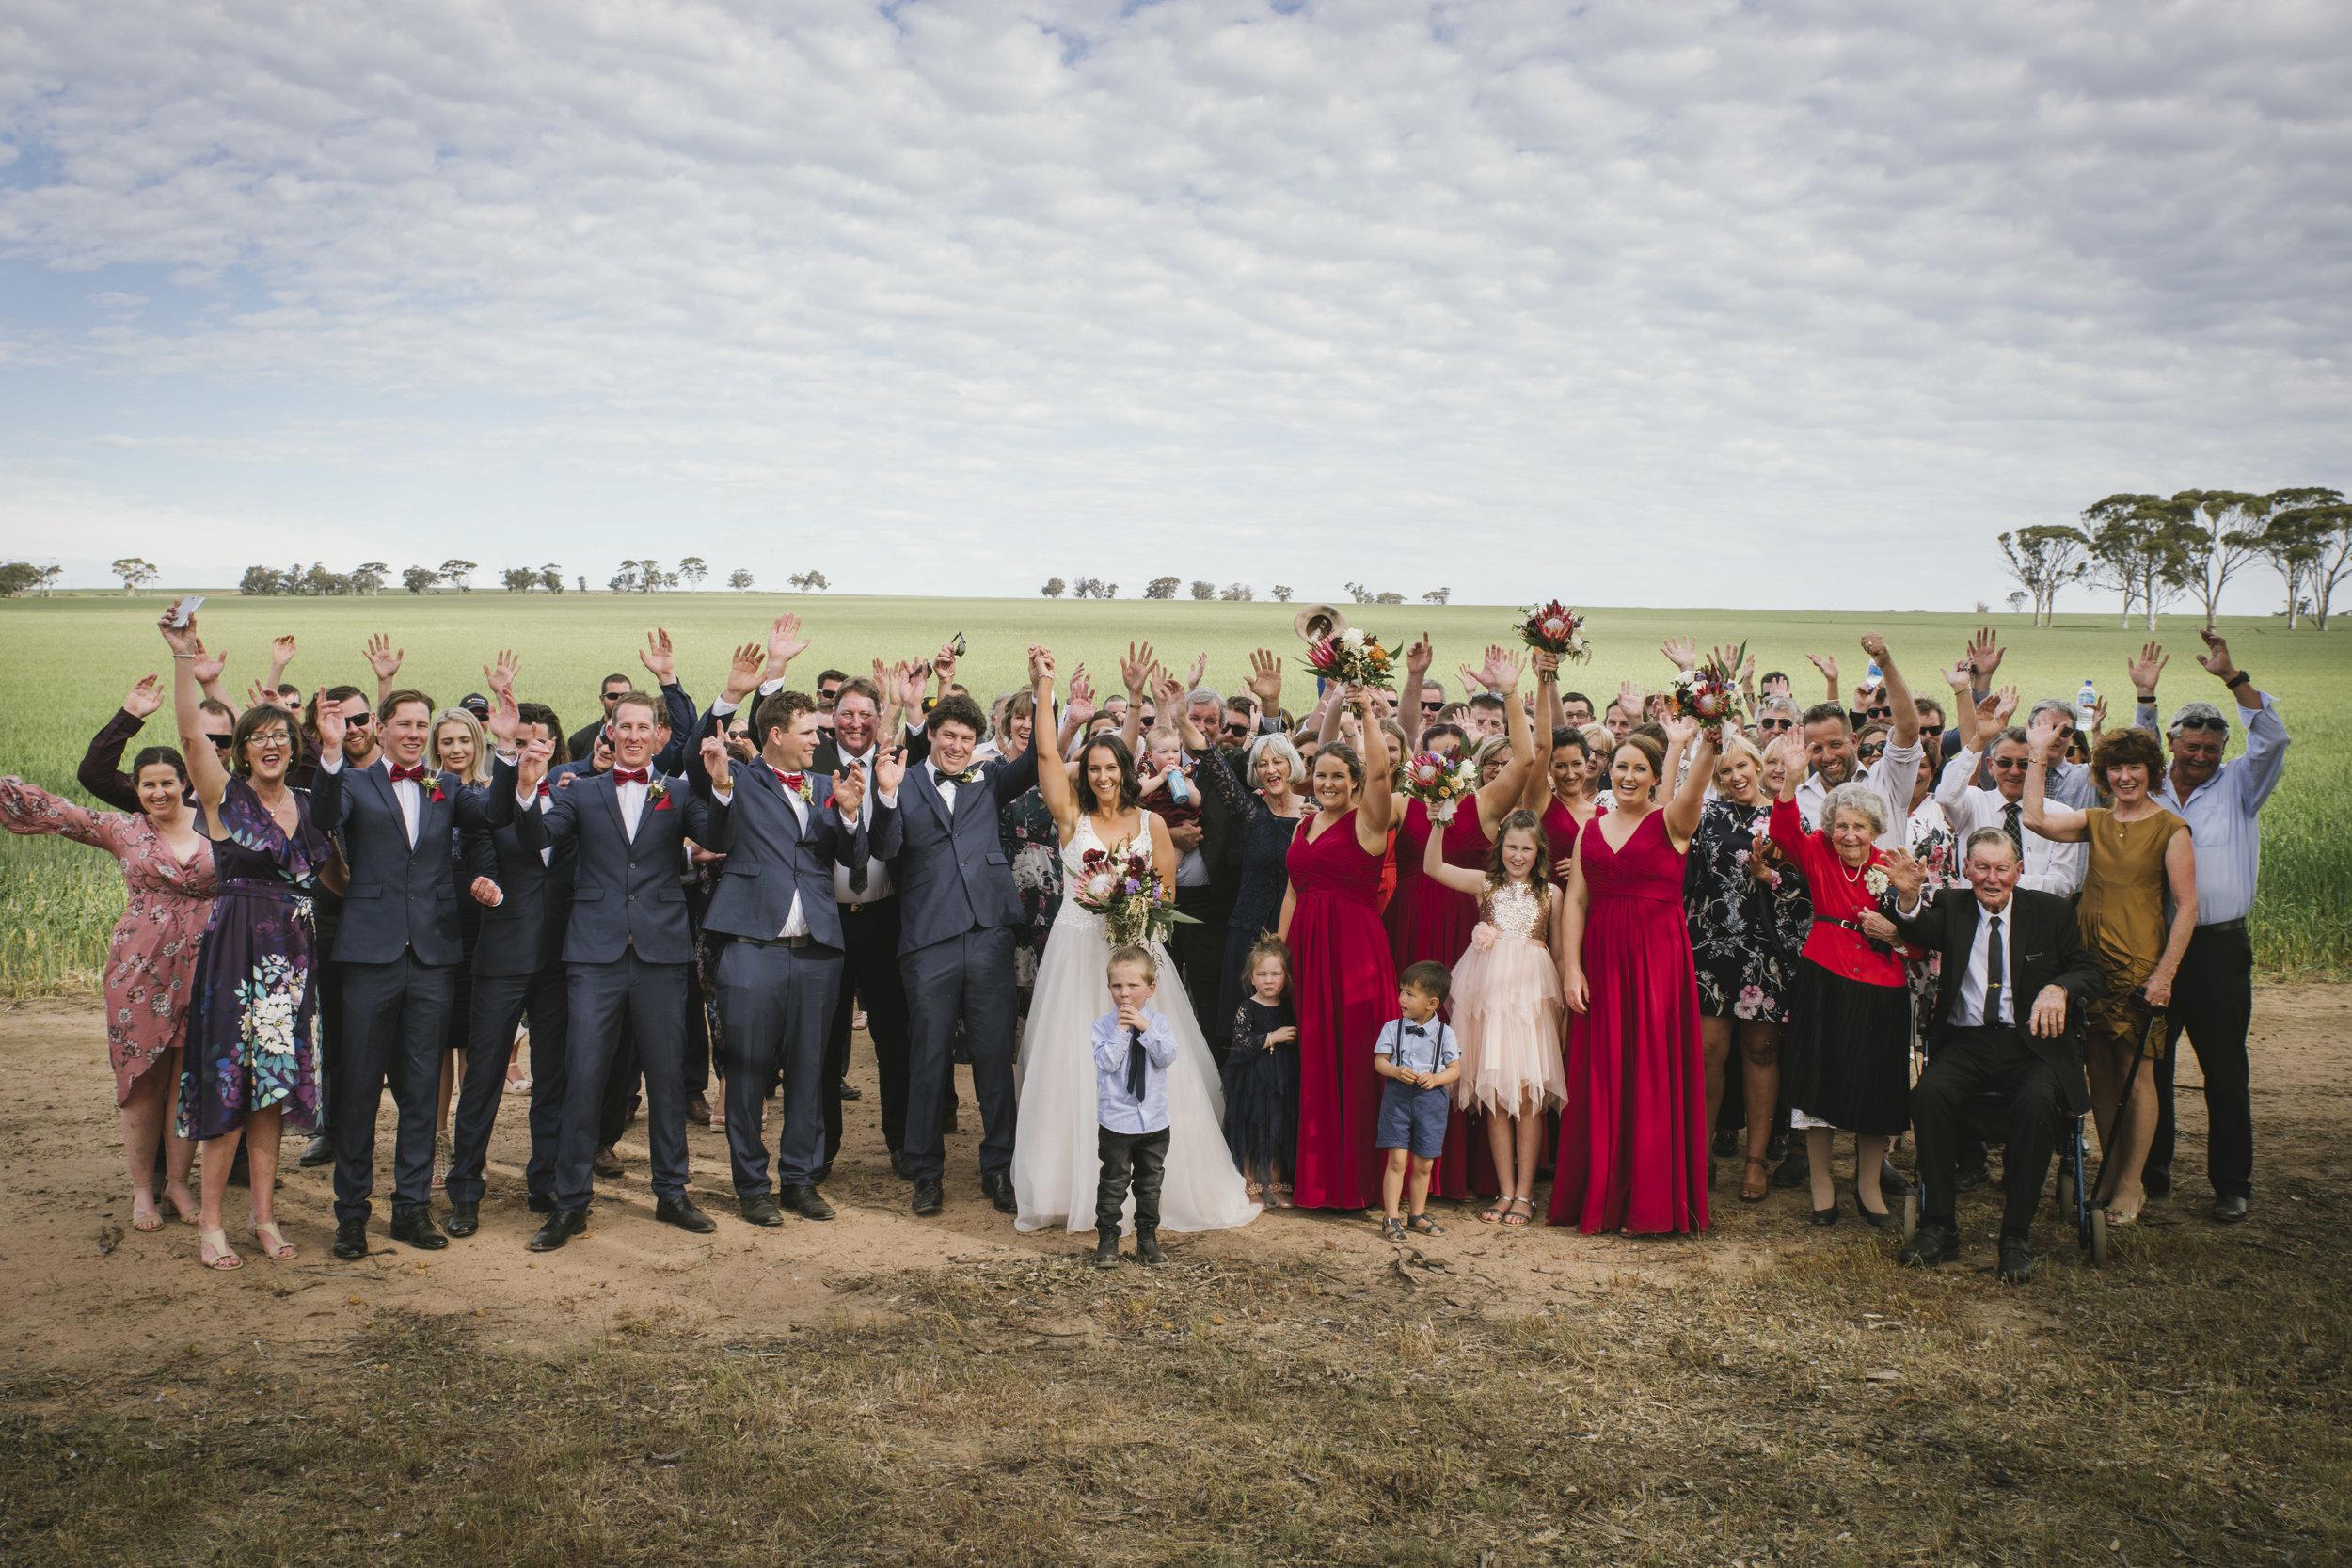 Angie Roe Photography Wheatbelt Avon Valley Farm Wedding (29).jpg